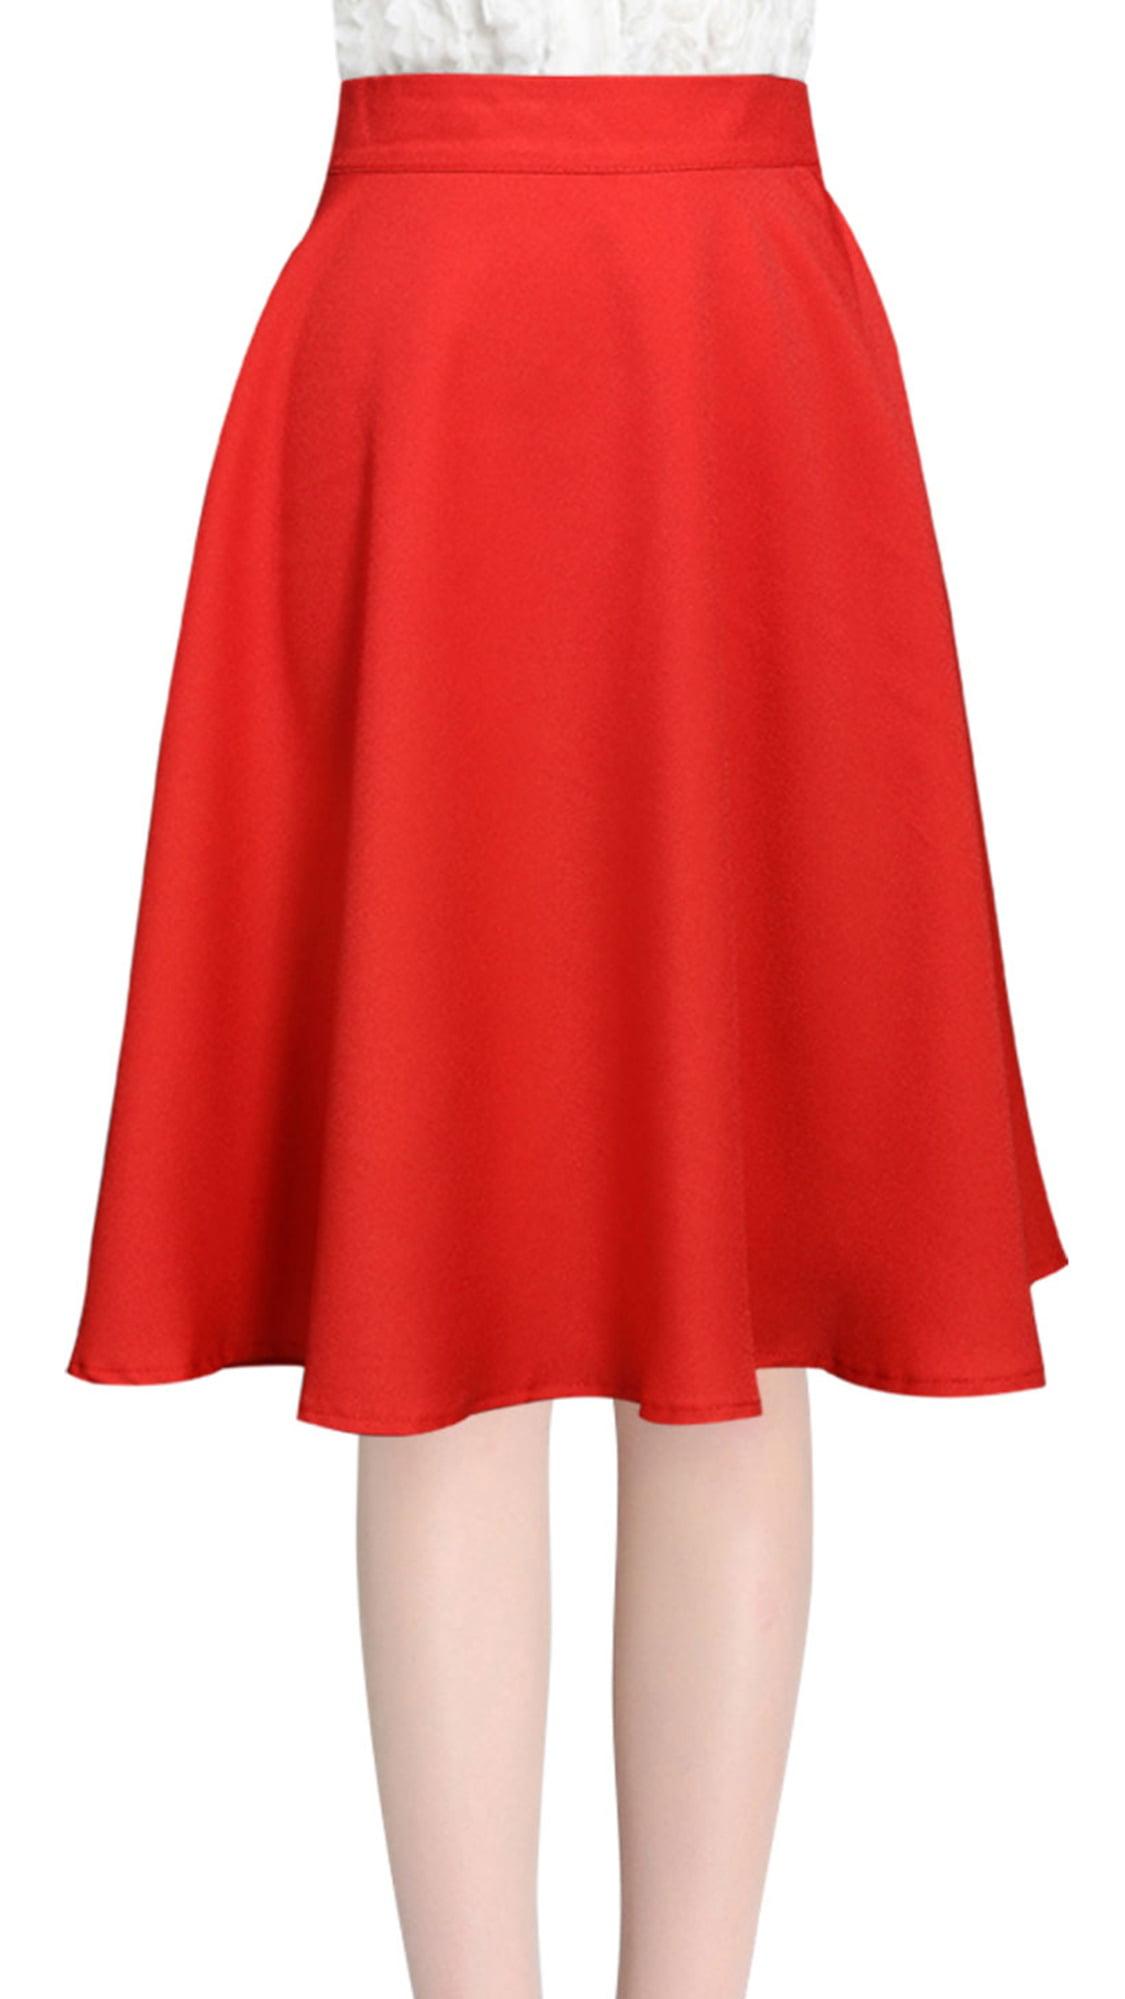 Knee Length Round Hem Stylish Full Skirt for Ladies by Unique-Bargains